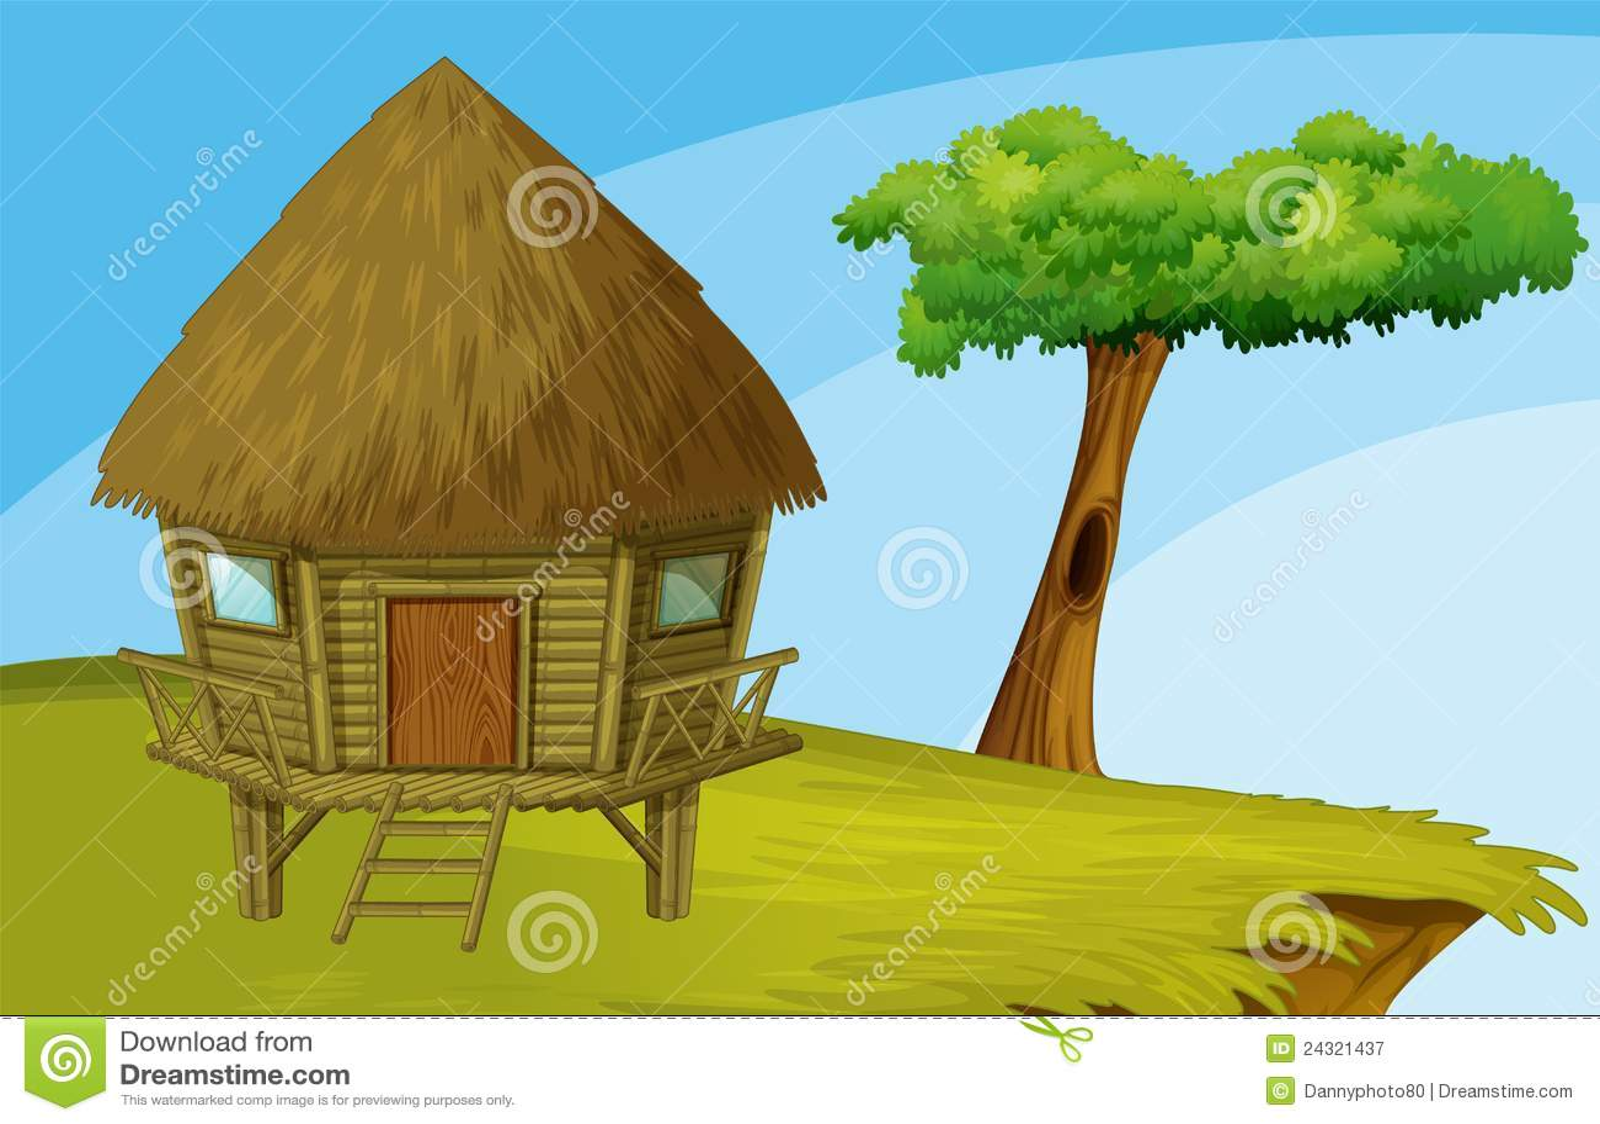 Beach And Beach Hut And Forest Cartoon